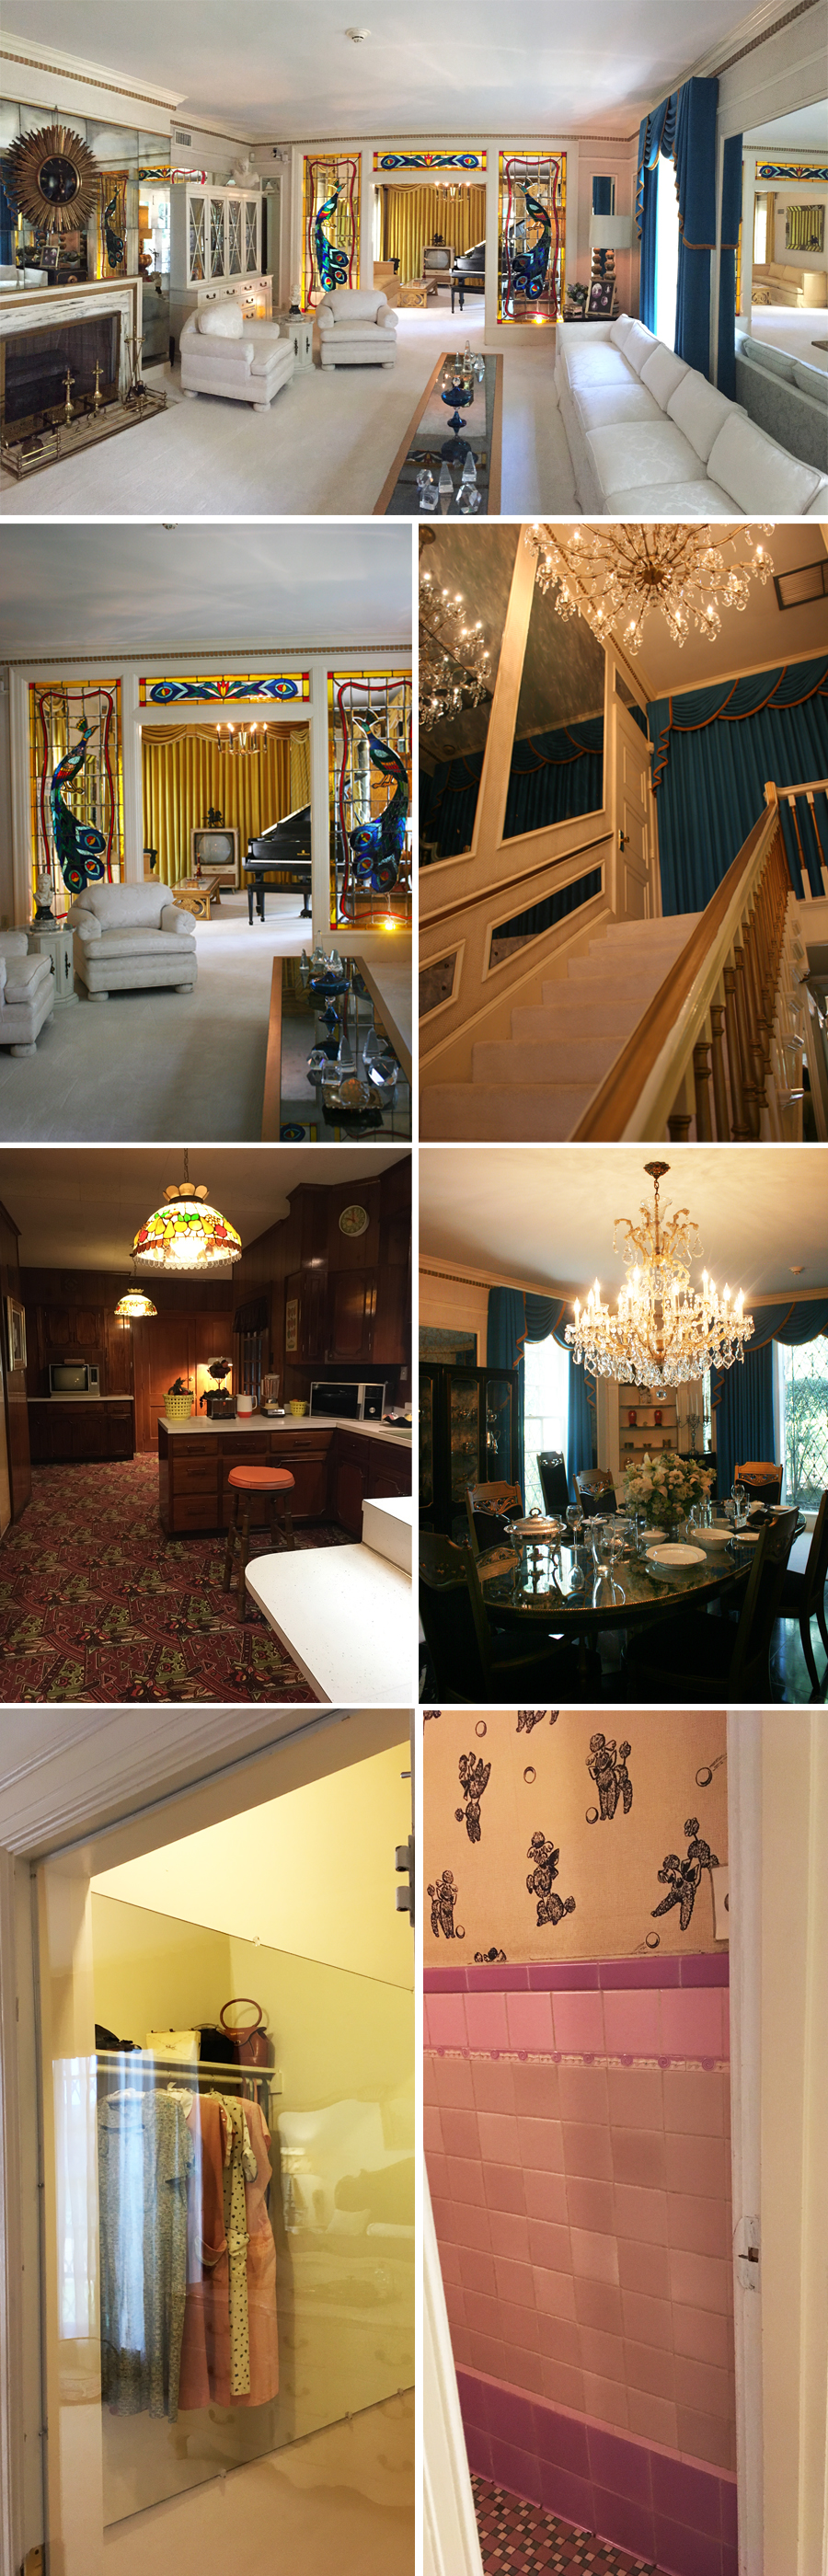 Inside Graceland 1